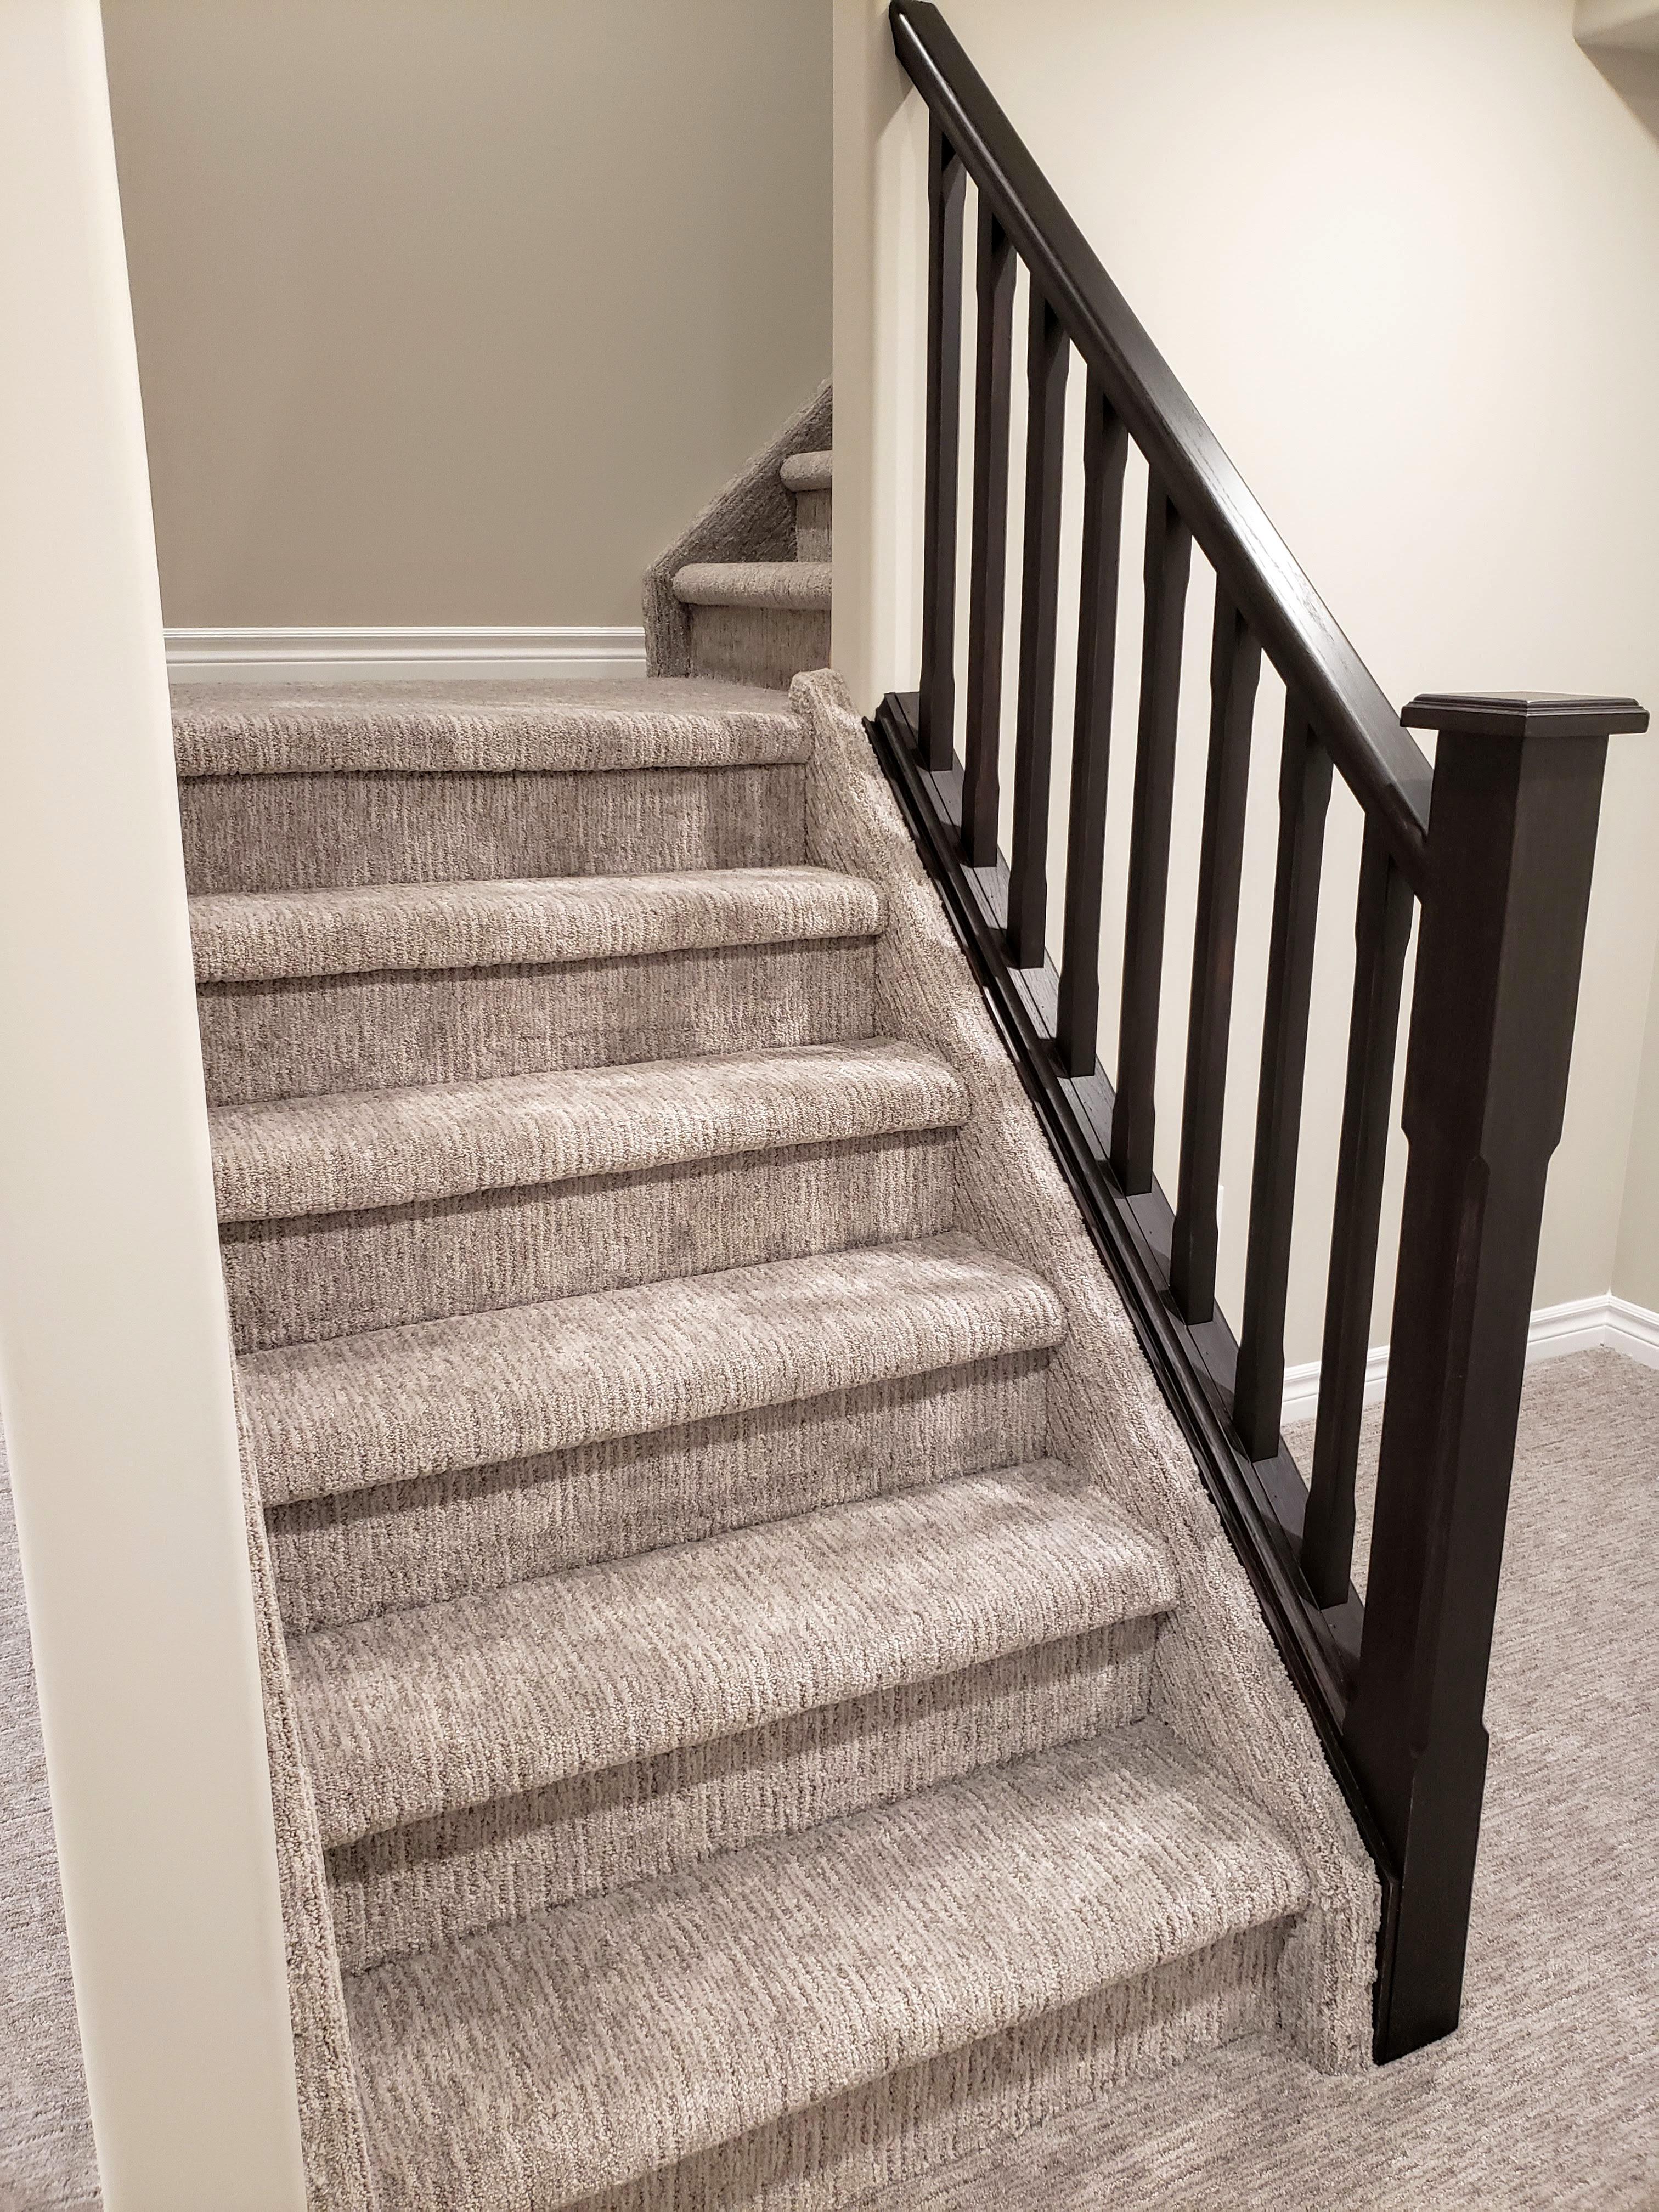 Oak railing in basement by Germano Creative Interior Contracting Ltd.